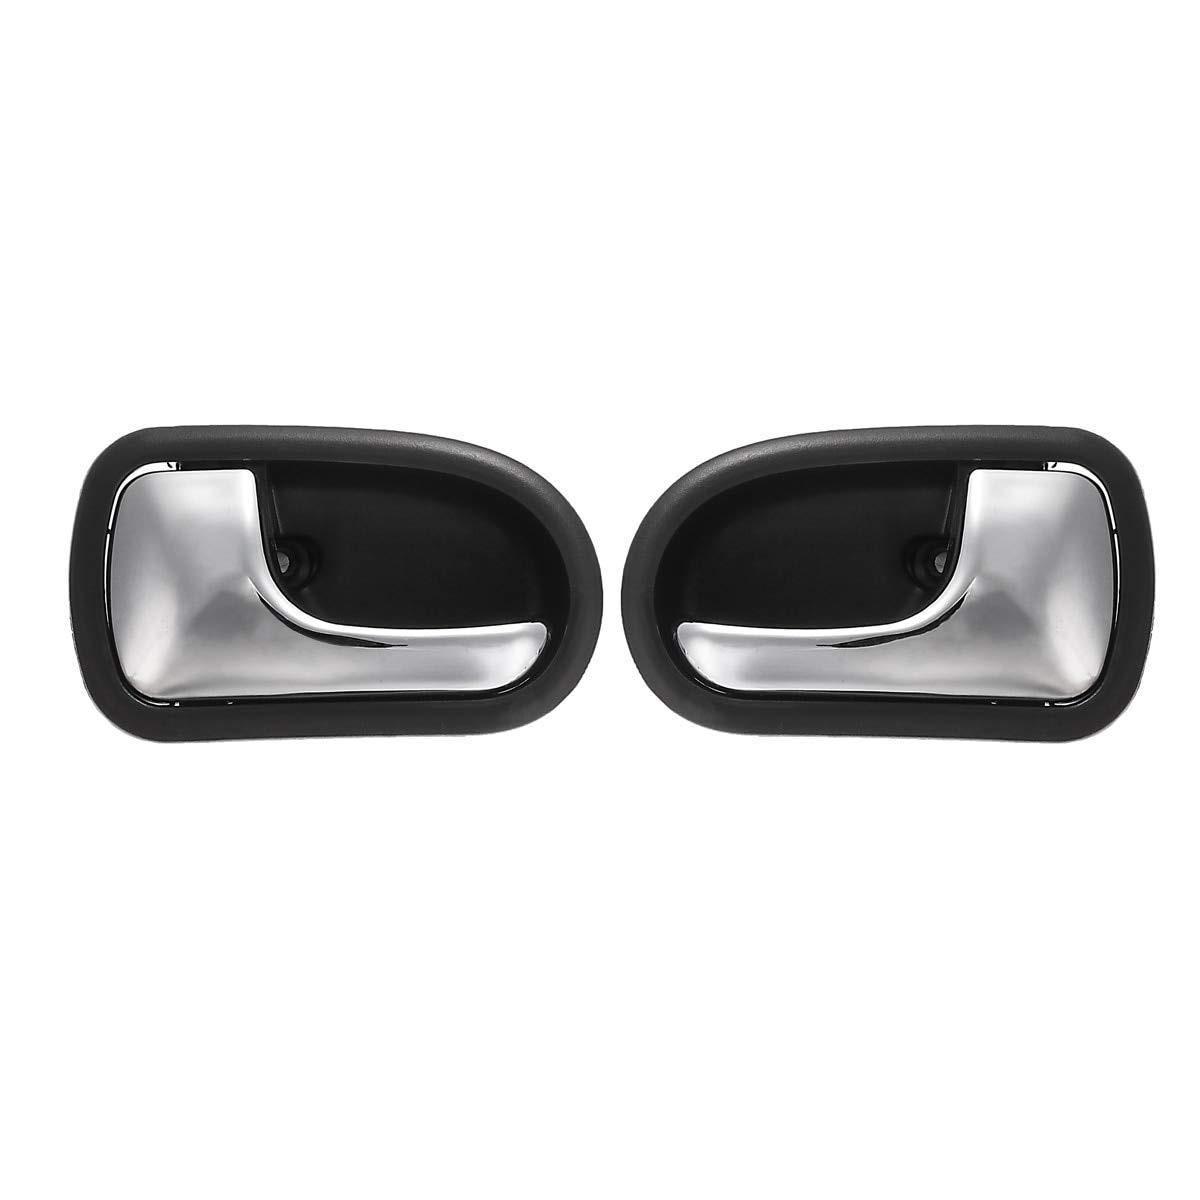 Left right car front rear chrome interior door handle for - 2002 mazda protege door handle interior ...